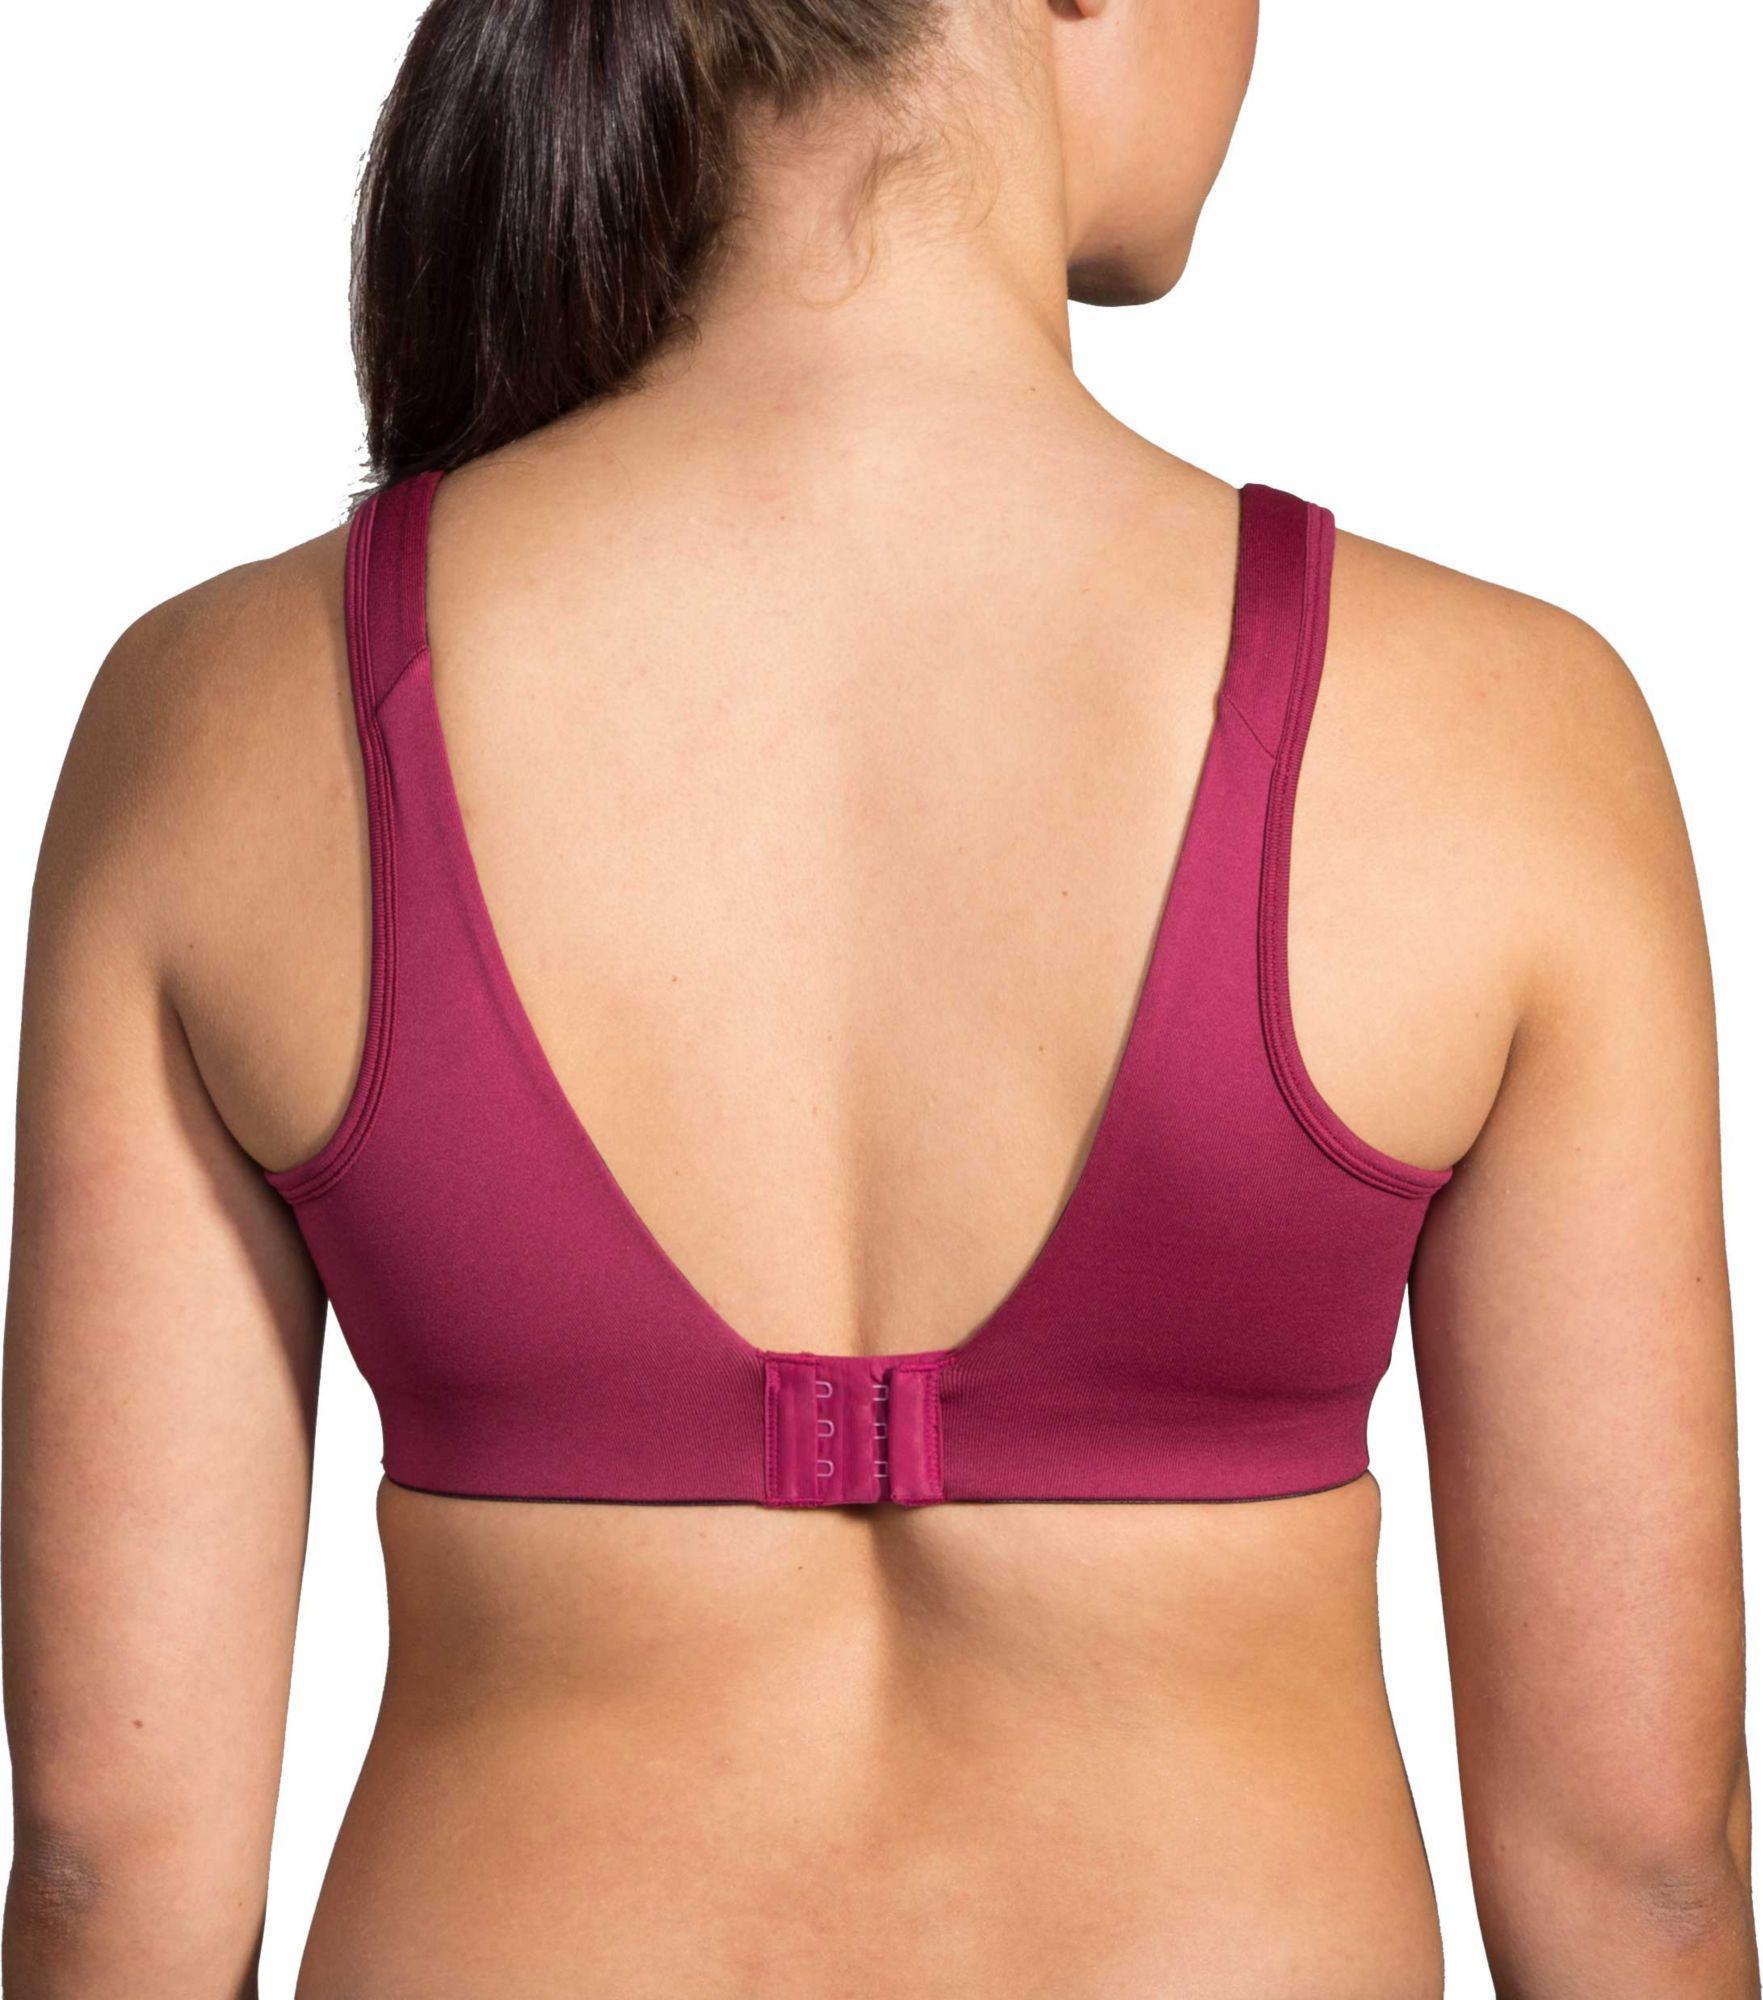 69ceb0182ffc8 Lyst - Moving Comfort Rooks Fiona Sports Bra in Purple